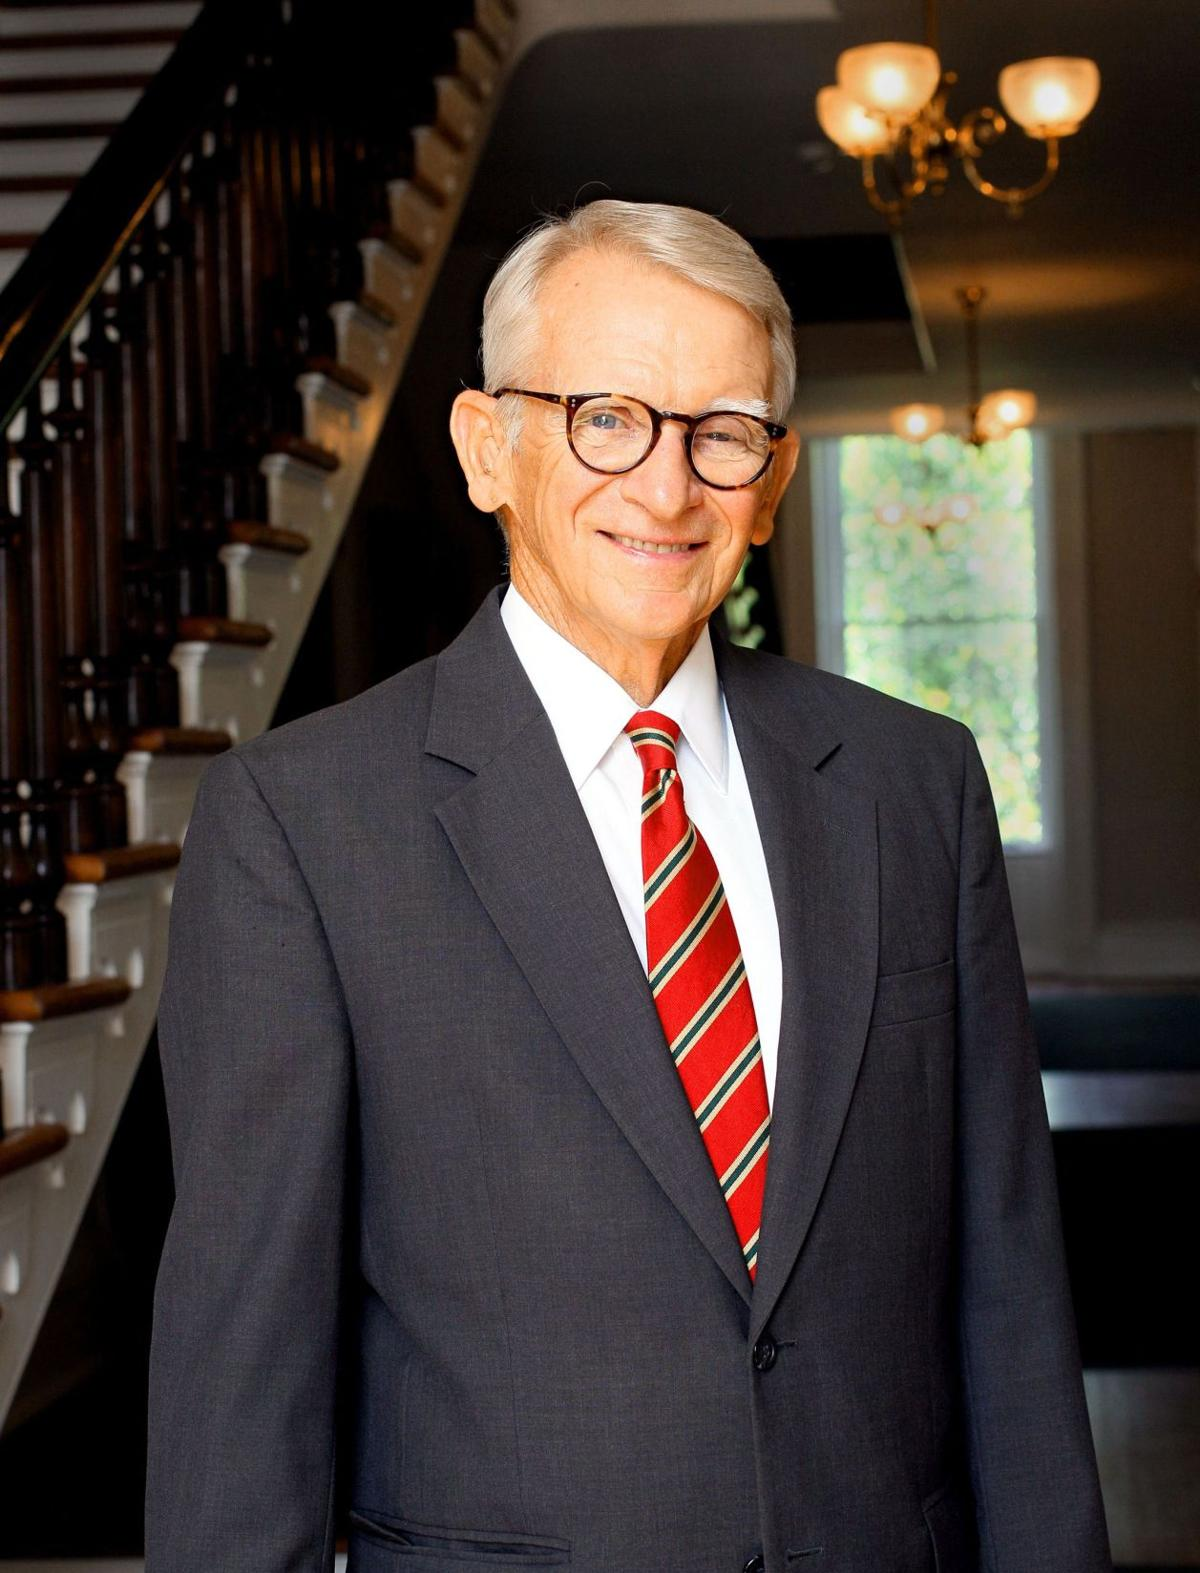 Charleston Mayor Joe Riley to give State of the City Address Tuesday